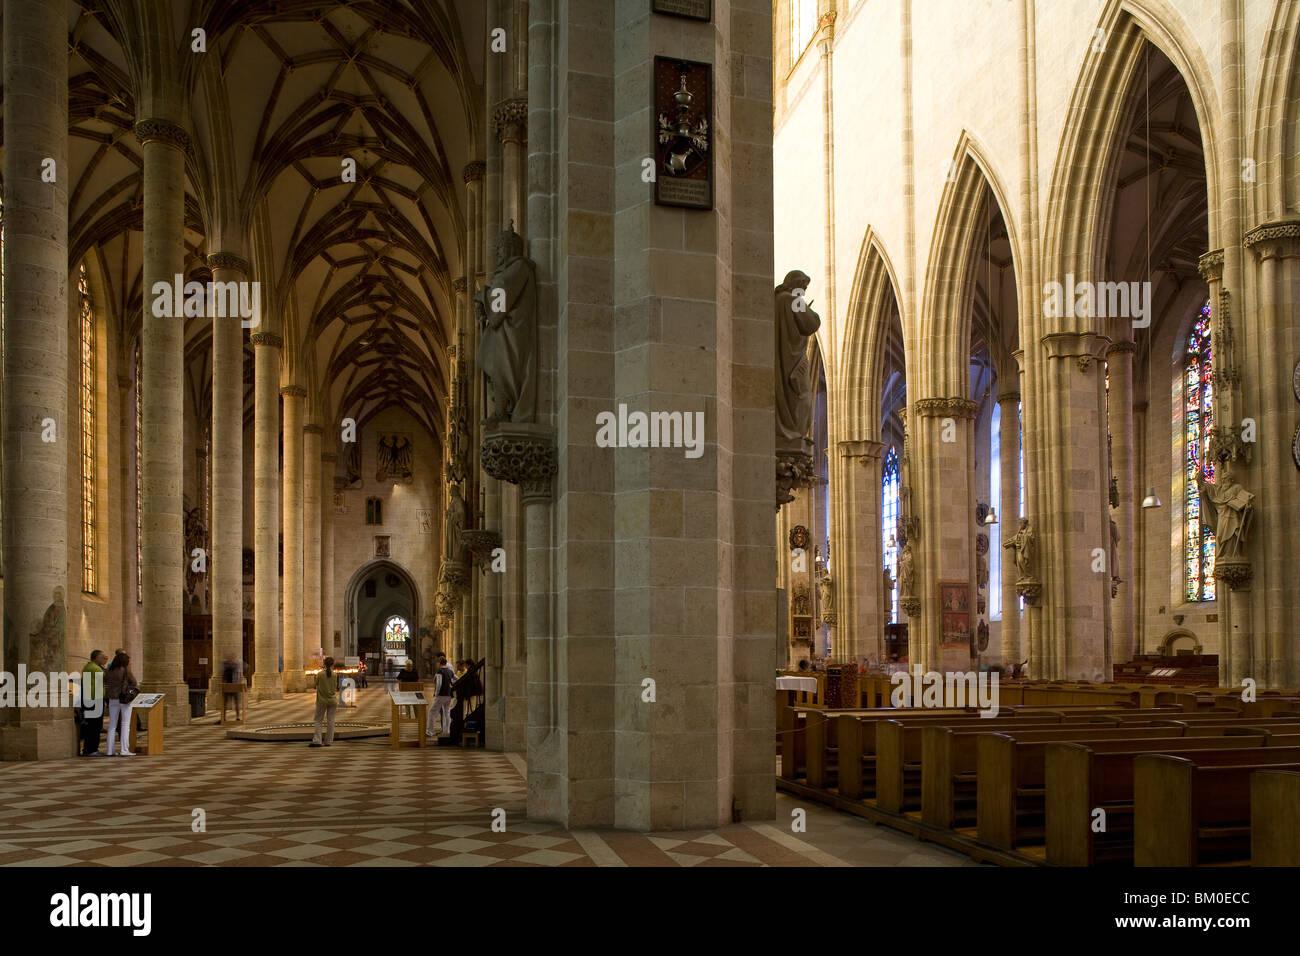 Interior view of Ulm Minster, Ulmer Muenster, Ulm, Baden-Wuerttemberg, Germany, Europe Stock Photo